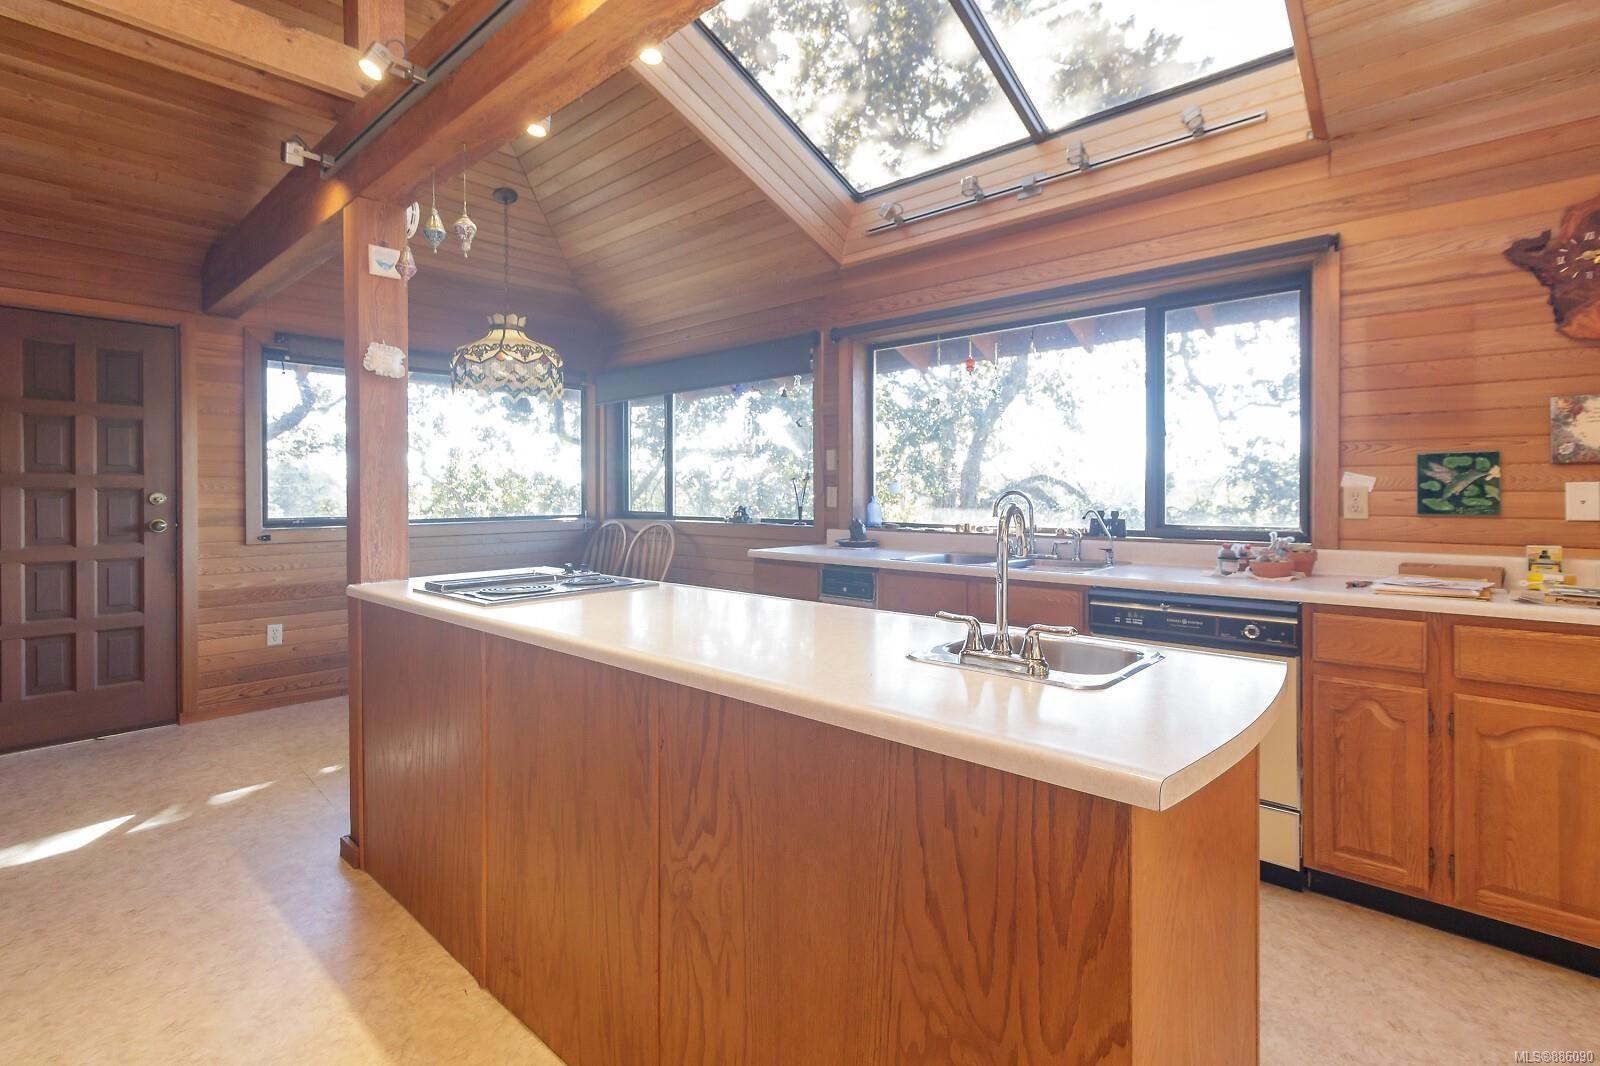 Photo 15: Photos: 4553 Blenkinsop Rd in : SE Blenkinsop House for sale (Saanich East)  : MLS®# 886090